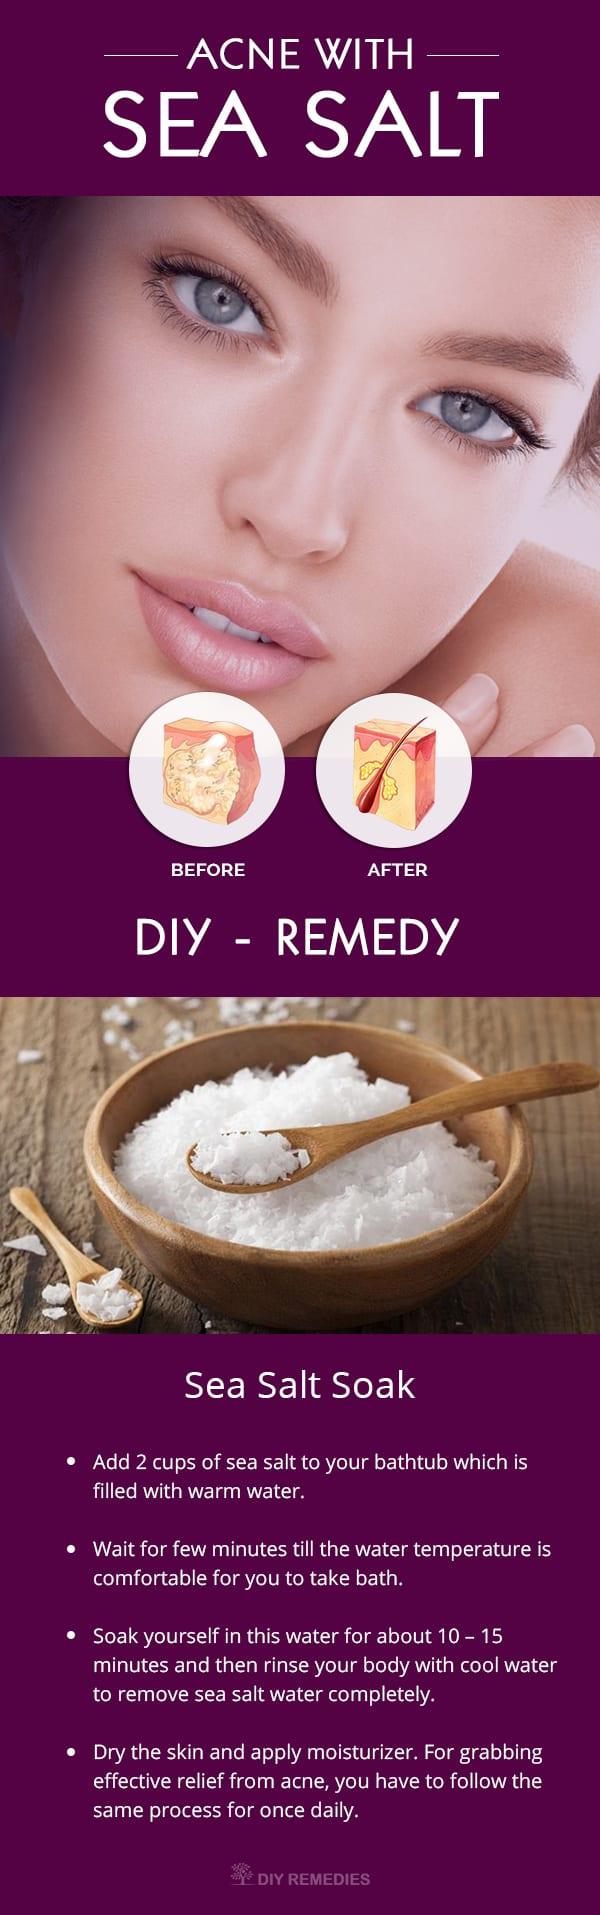 How to Treat Acne with Sea Salt